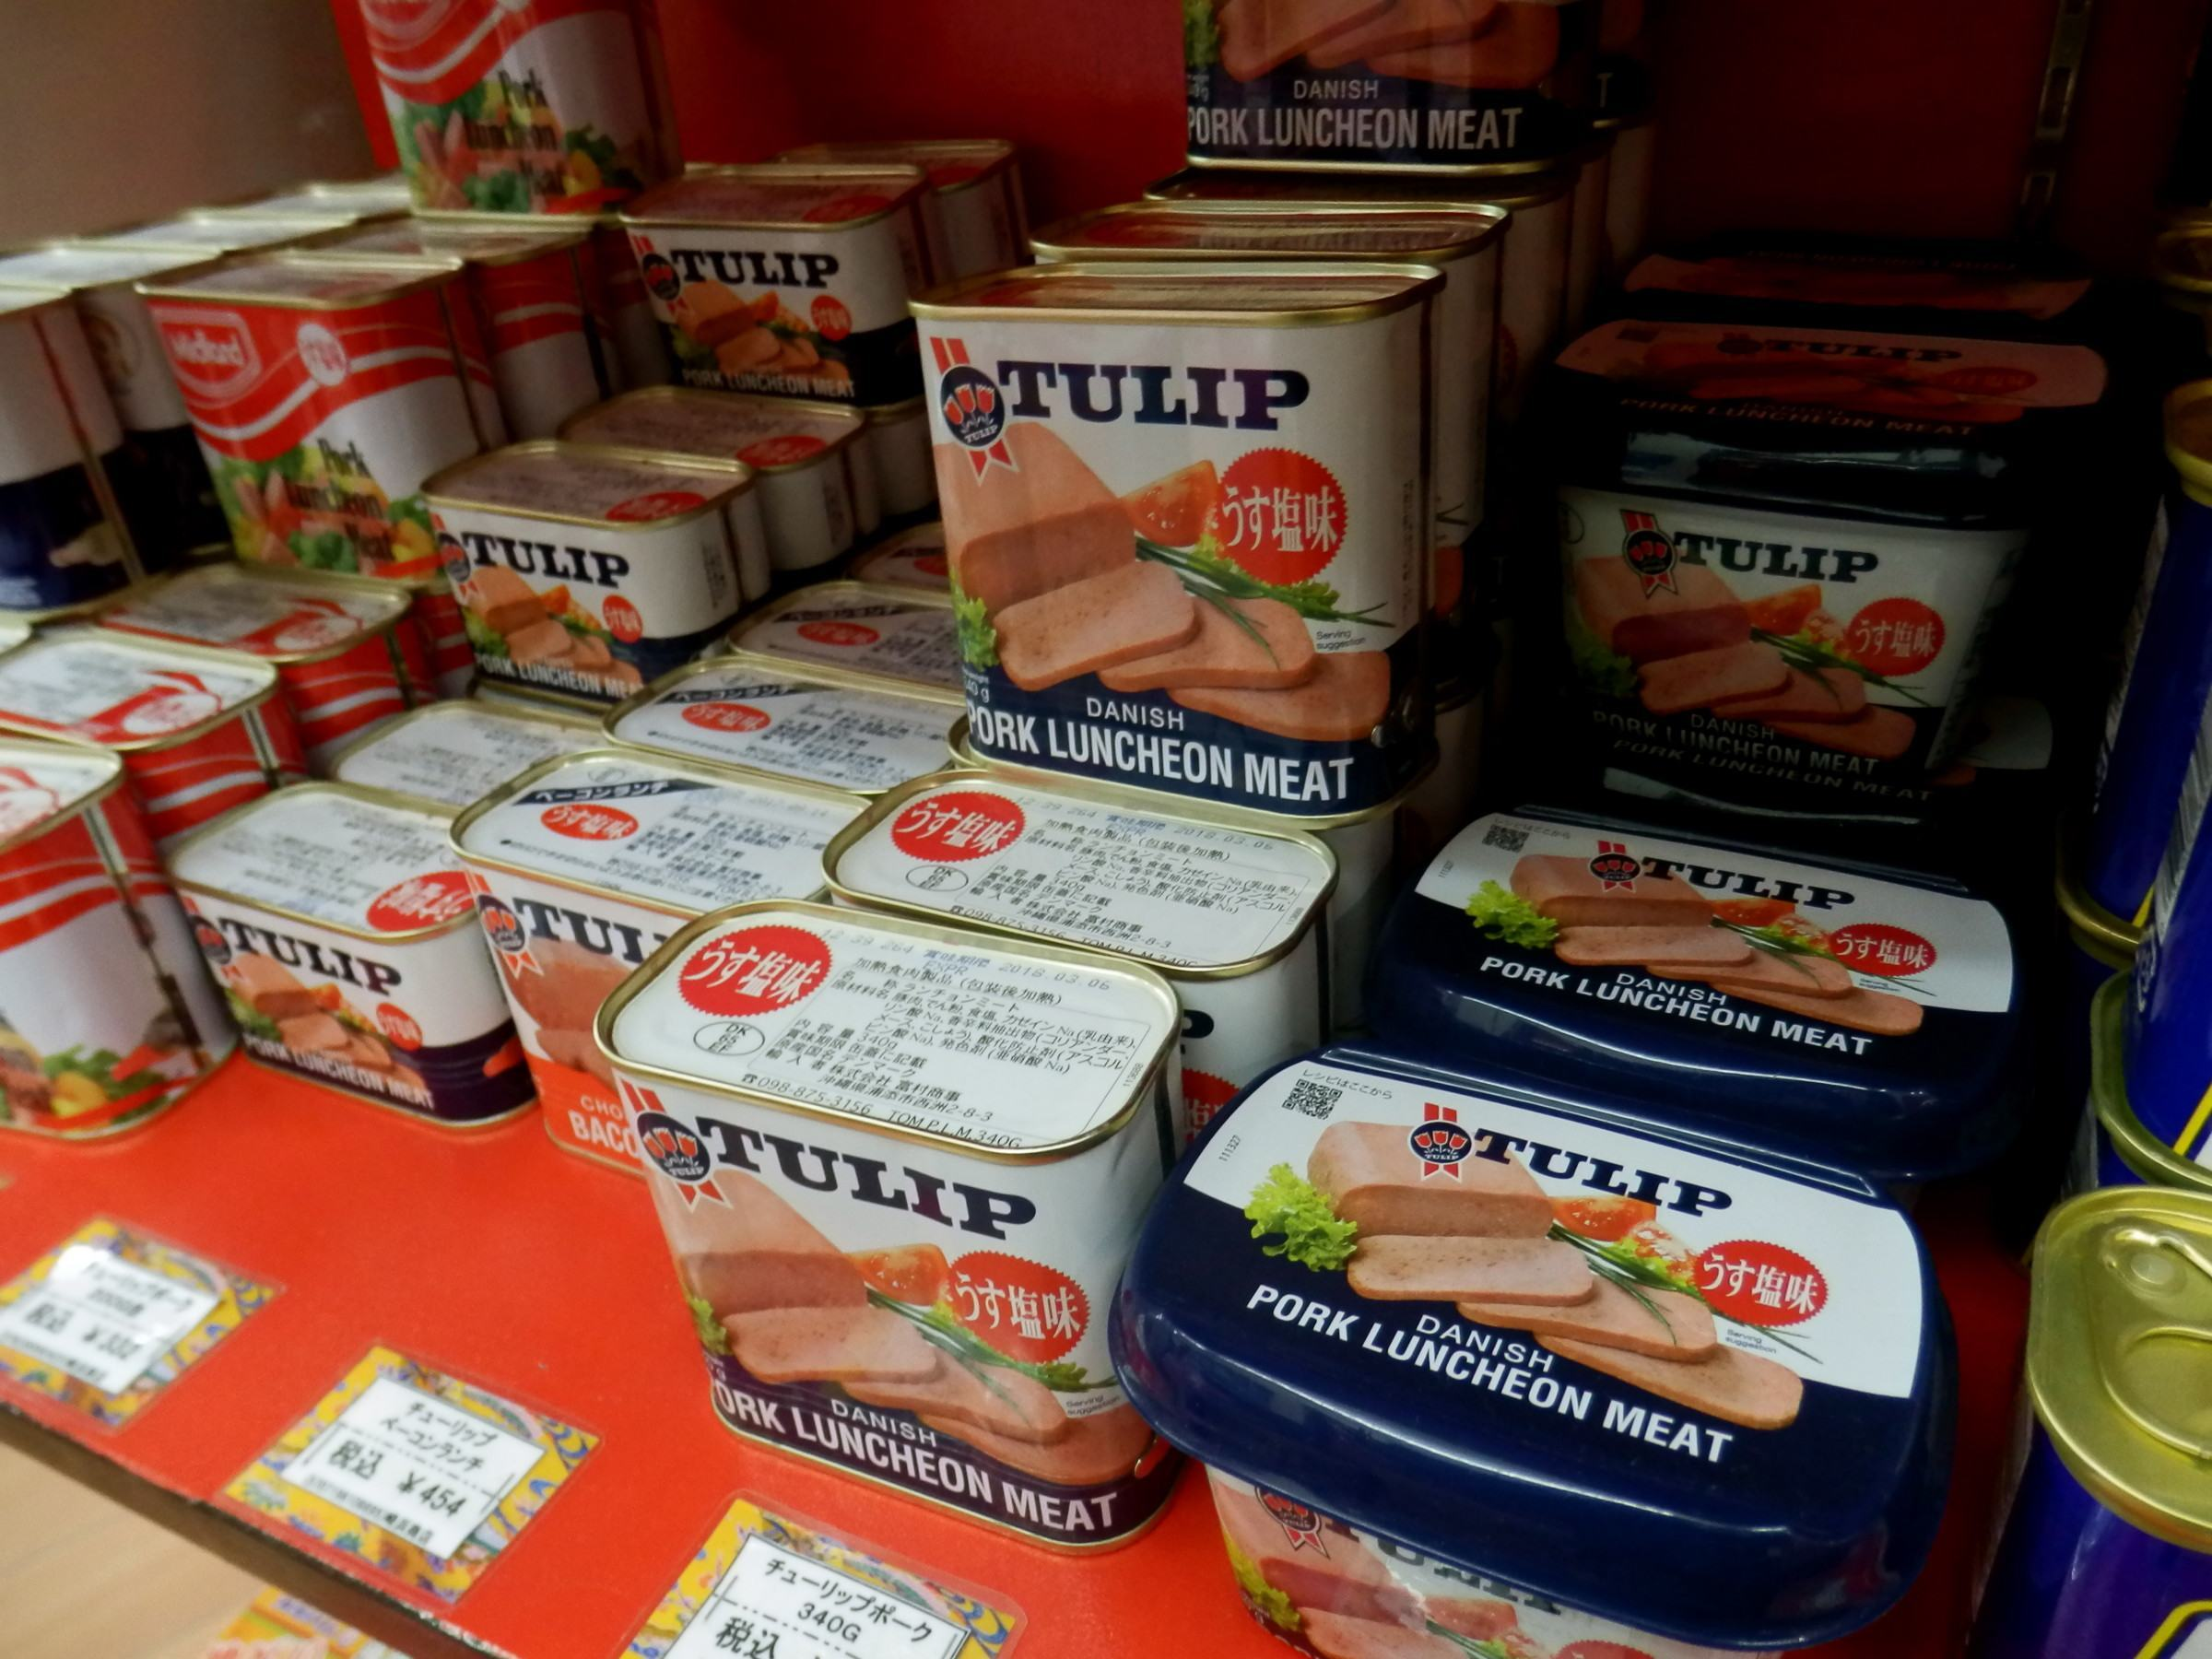 Varieties of luncheon meat for sale